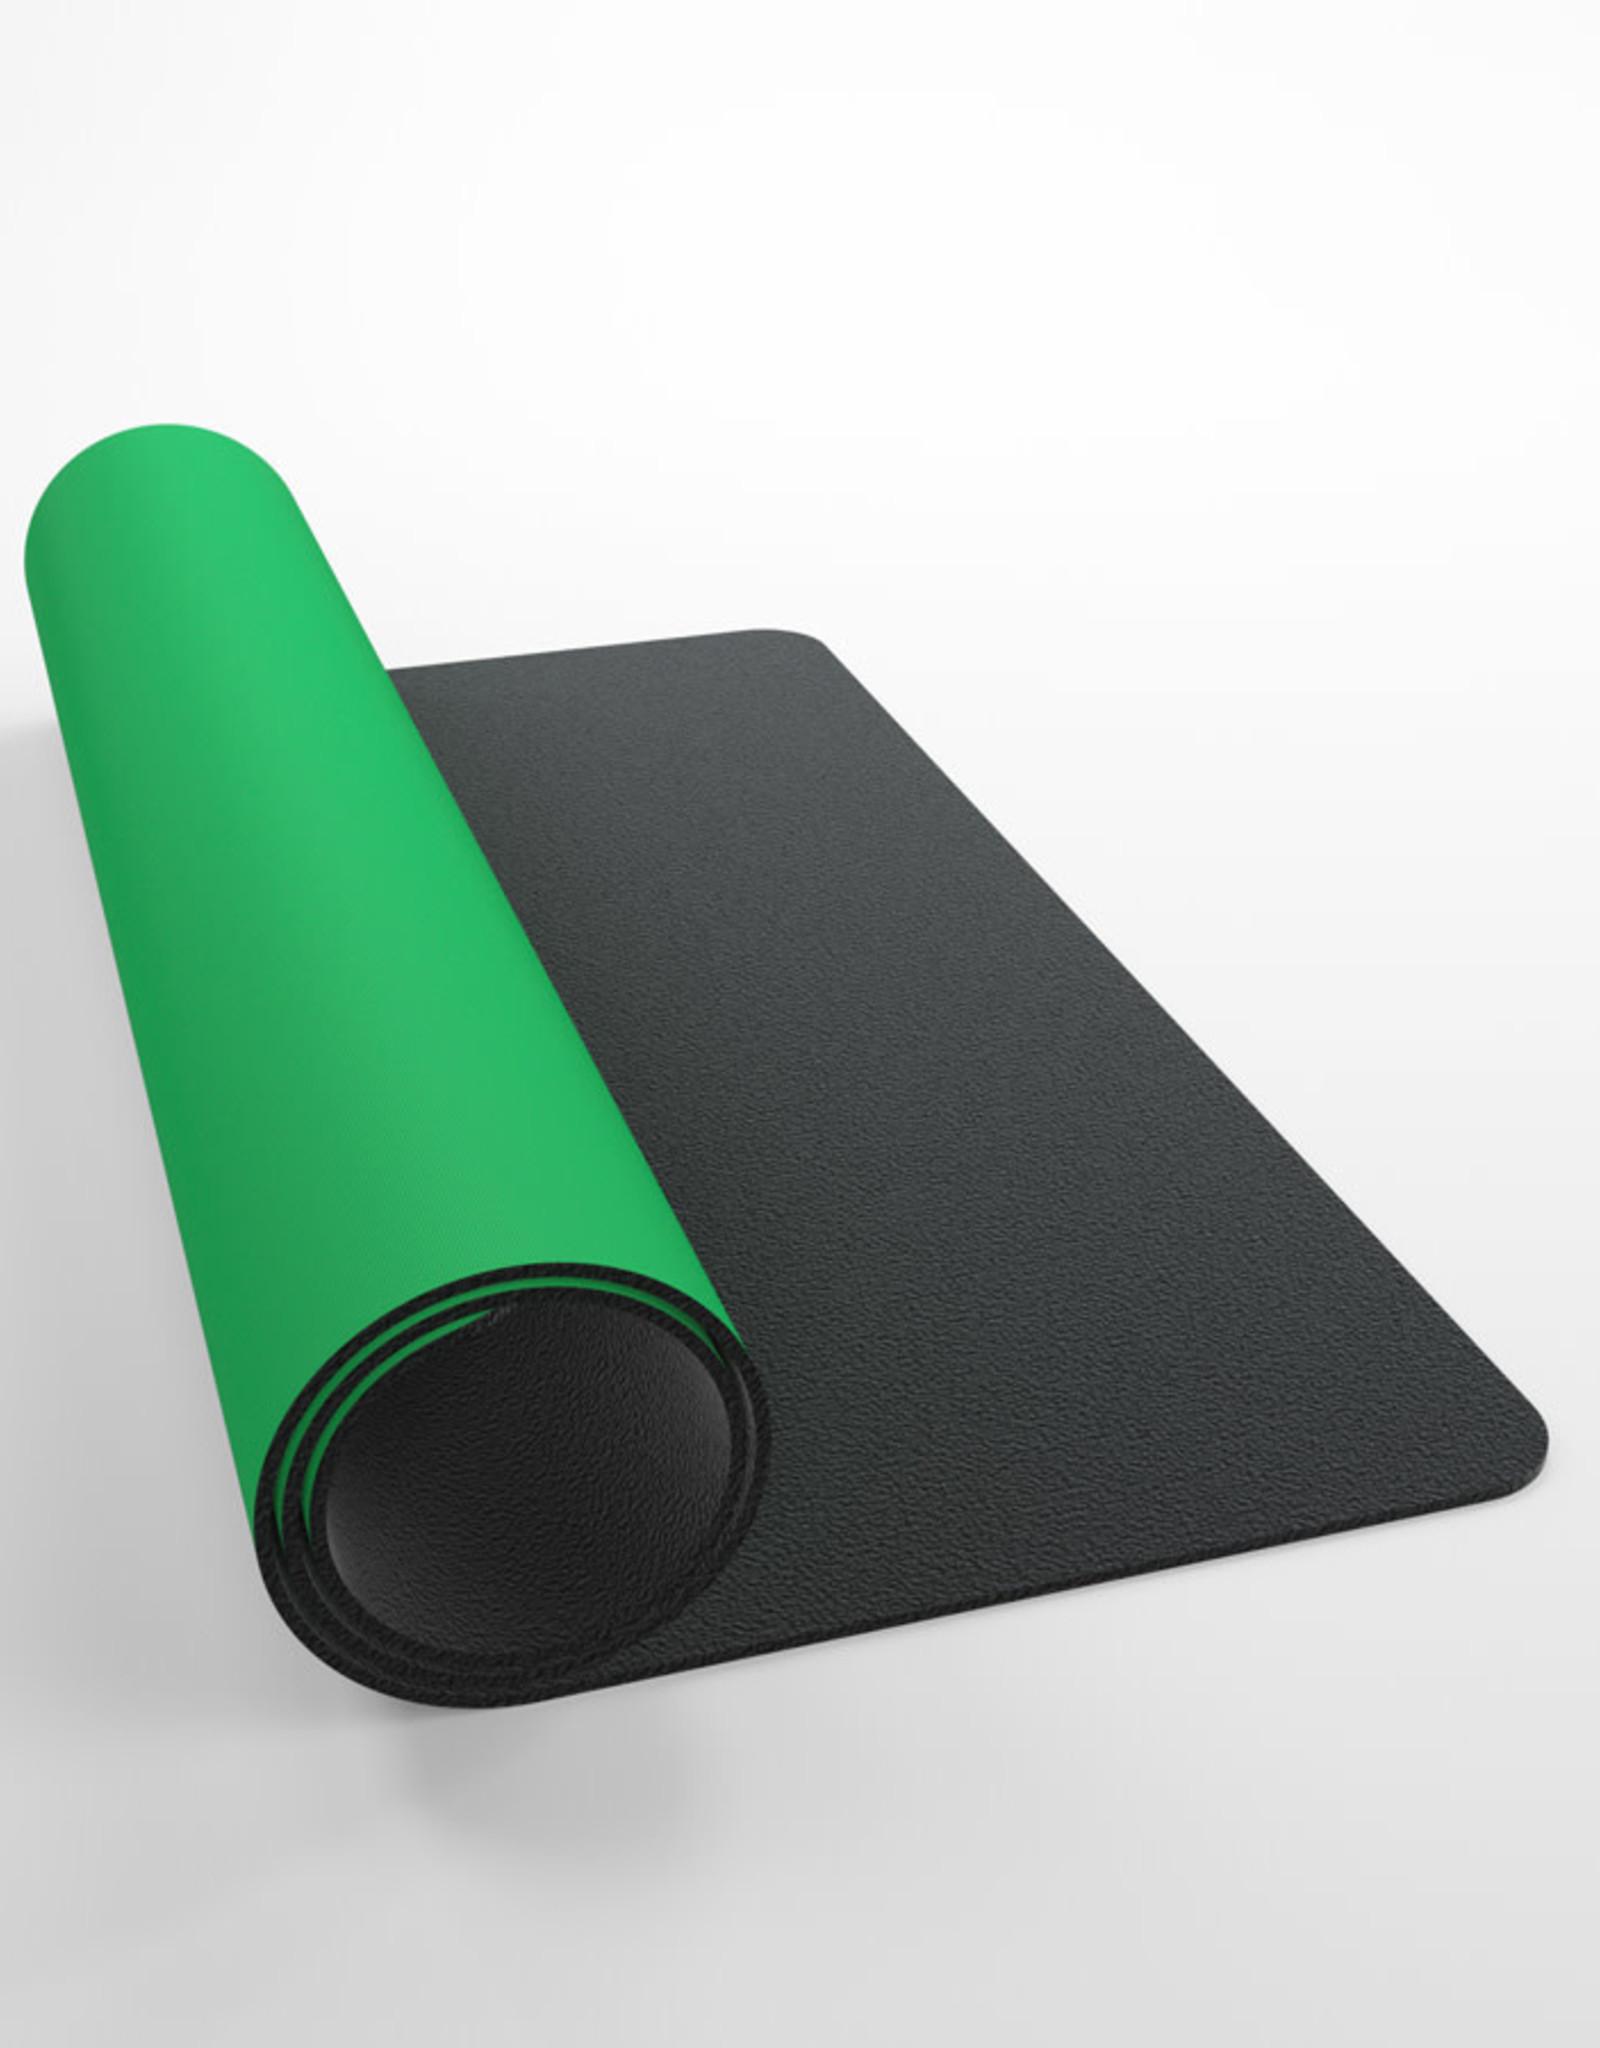 Prime Playmat: Green